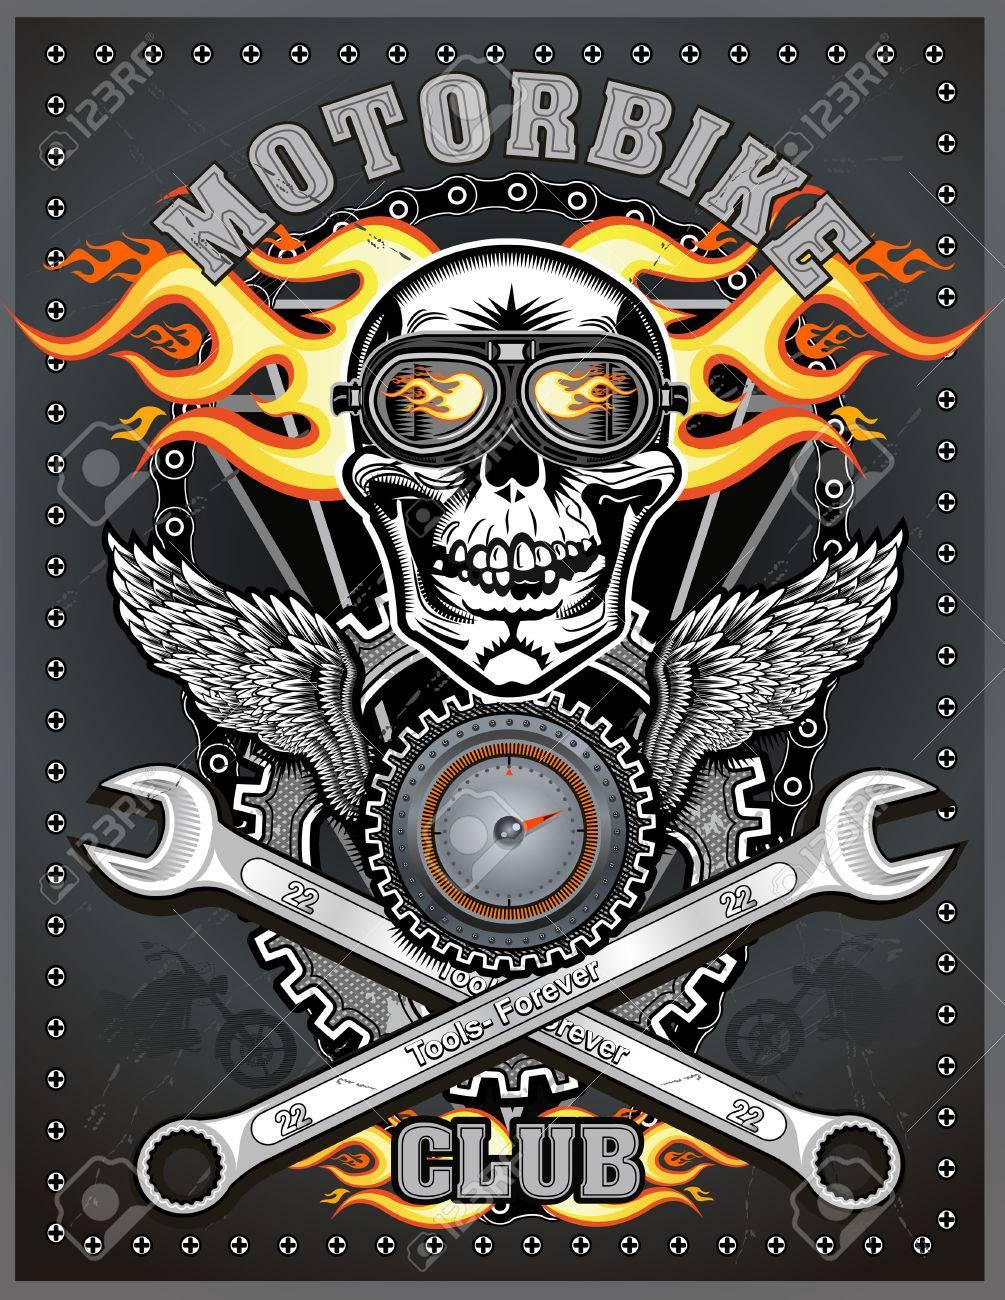 vintage motorcycle club. vector draving - 51083584